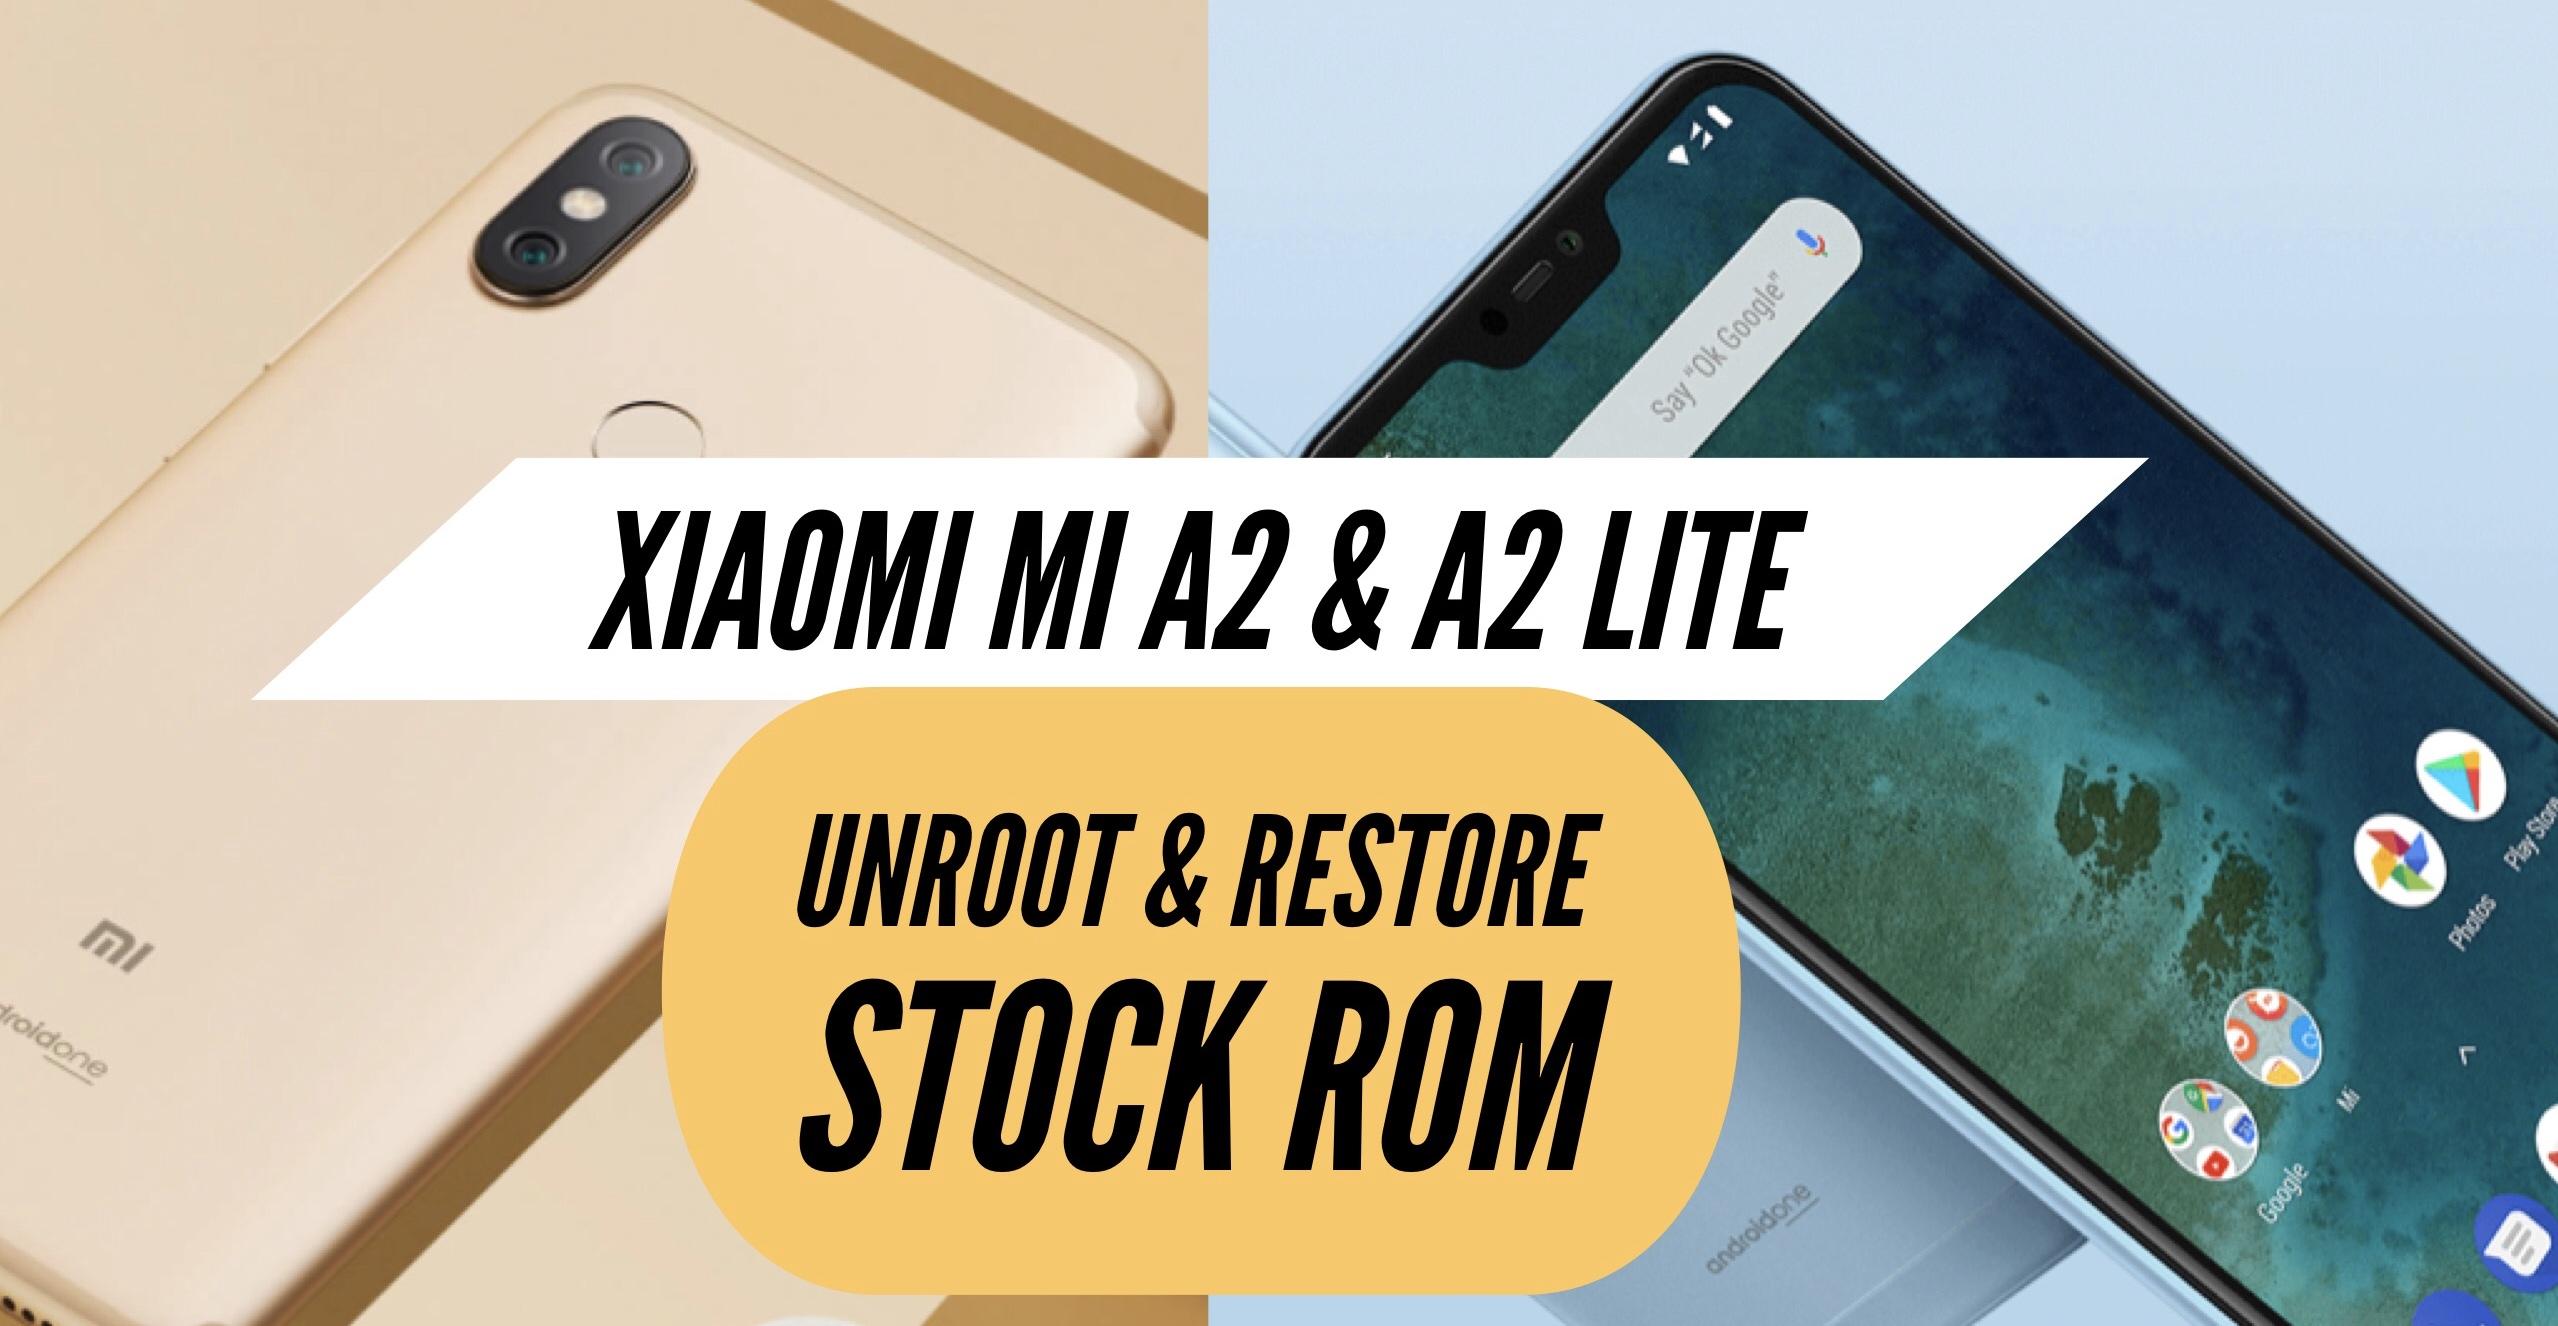 How to Unroot Xiaomi Mi A2 & A2 Lite & Restore Stock ROM